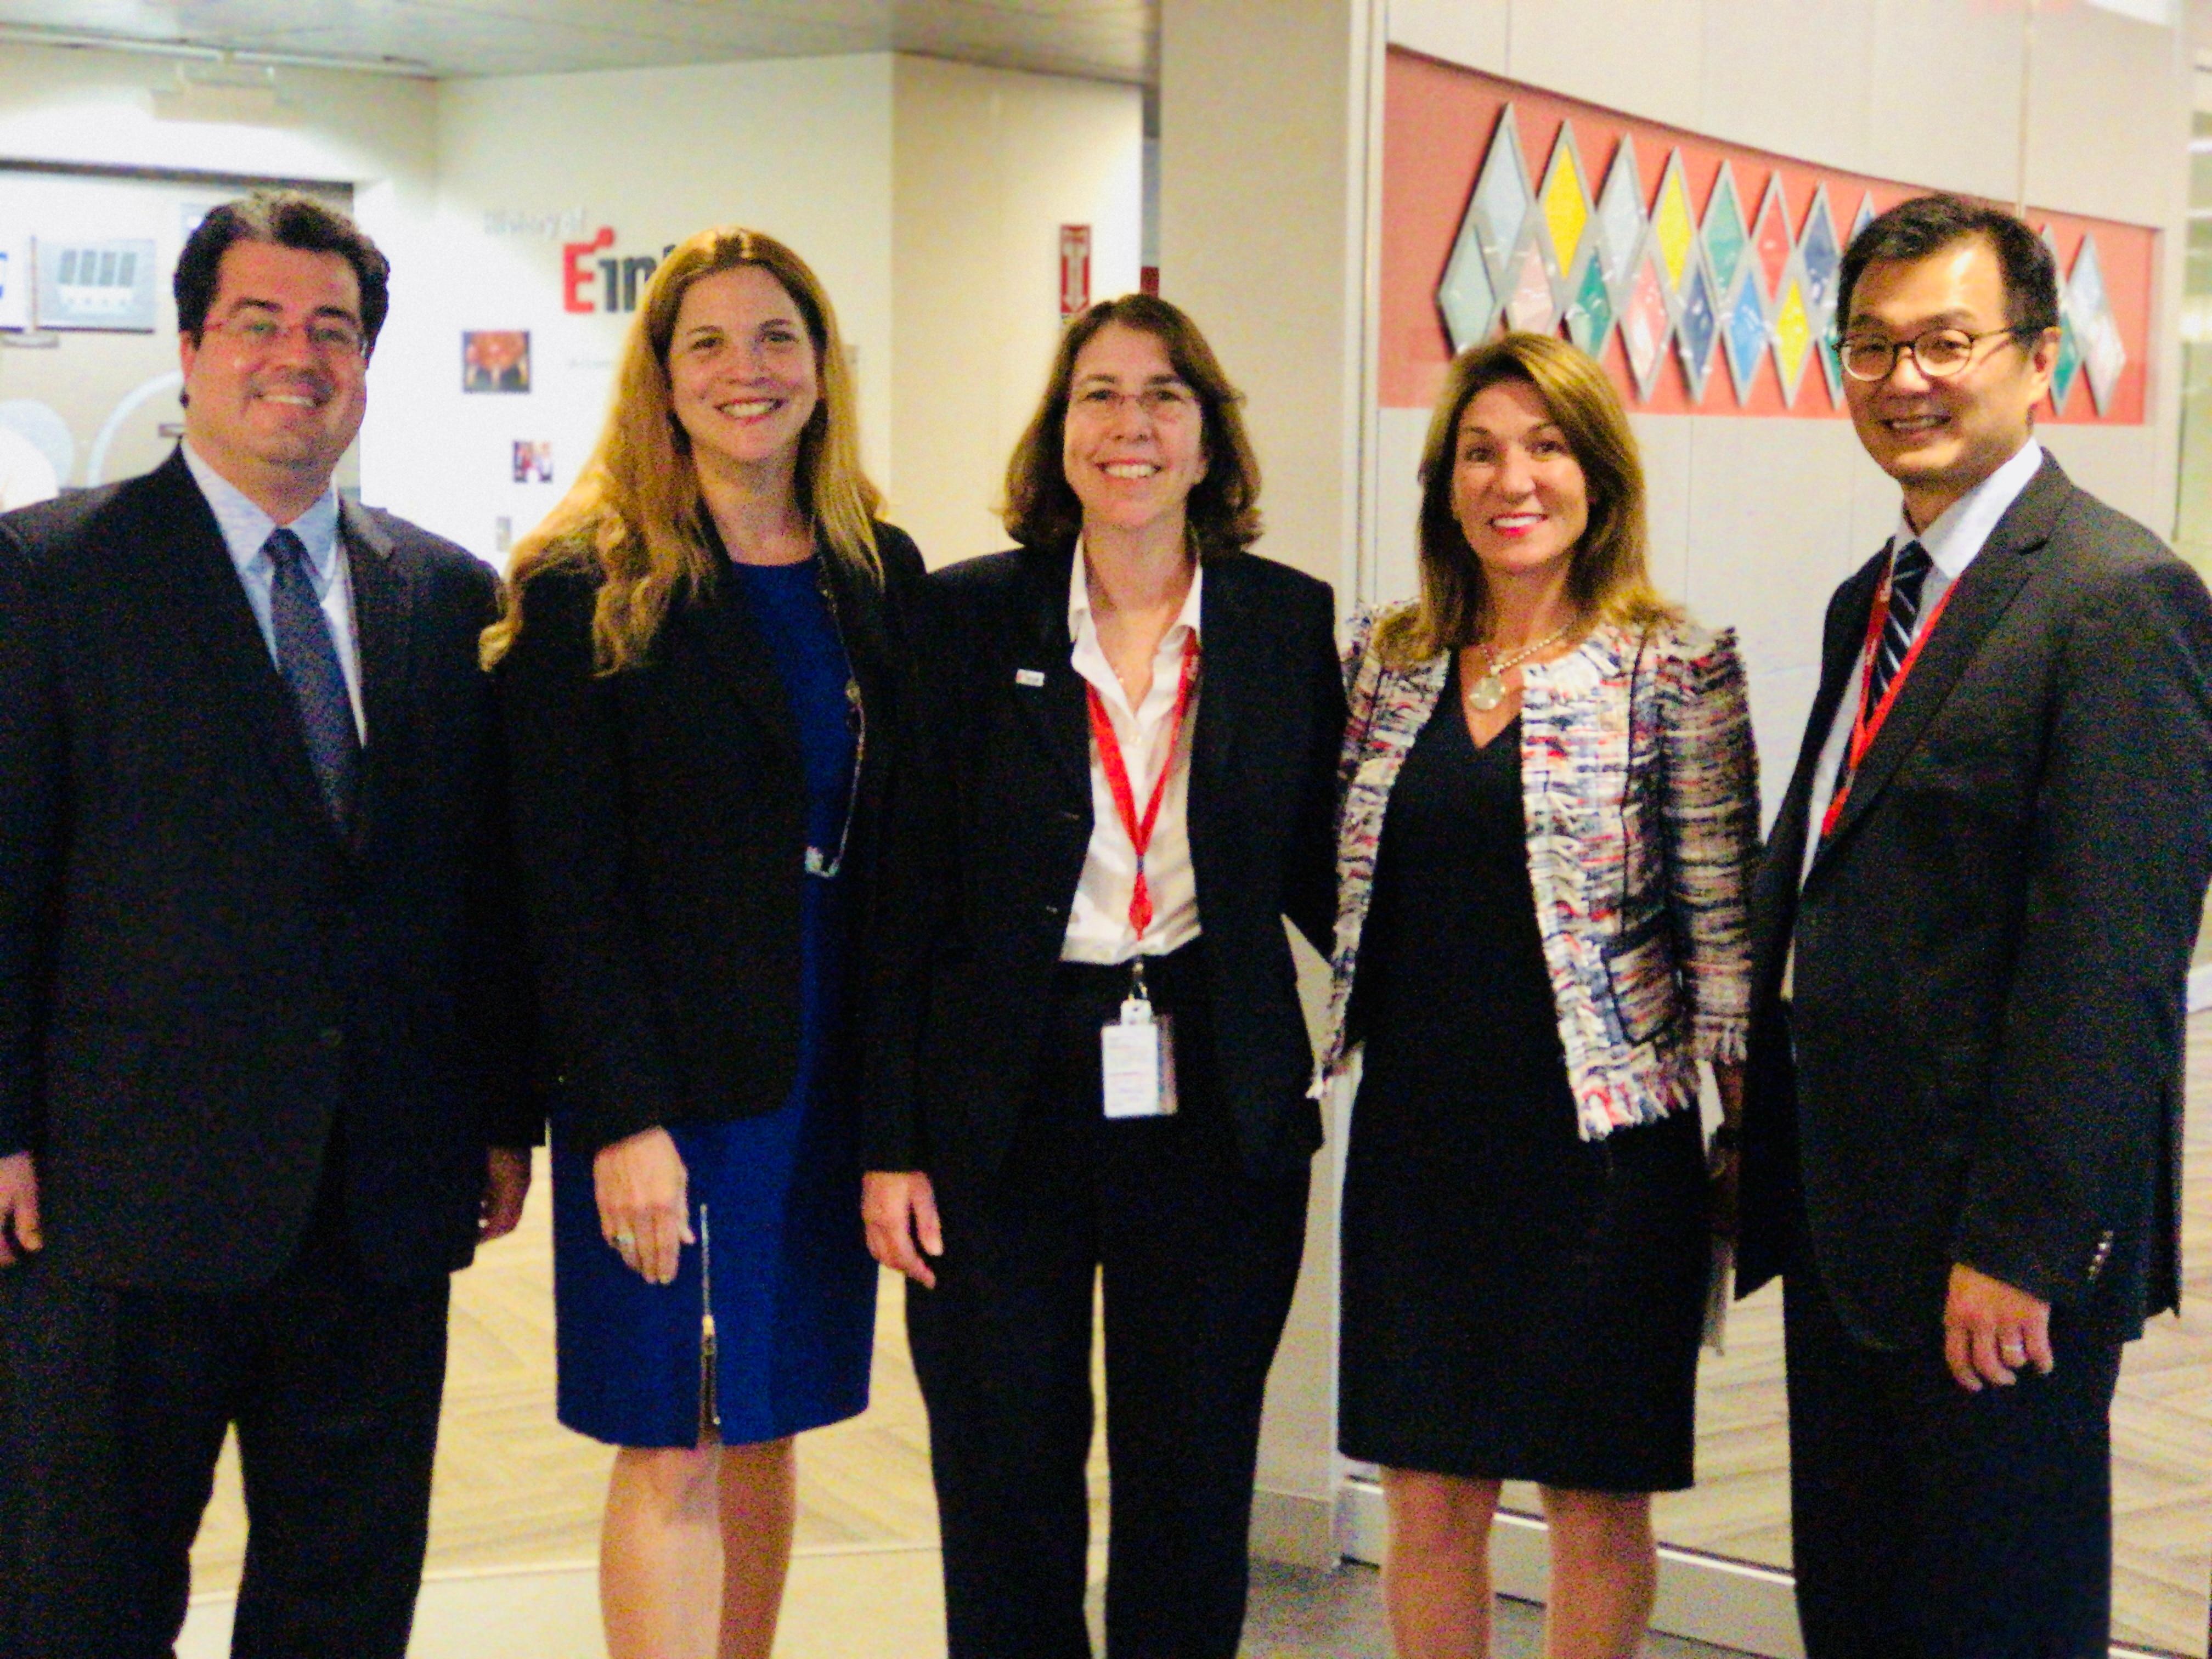 Secretary Acosta presenting Workforce Training Fund Program grants